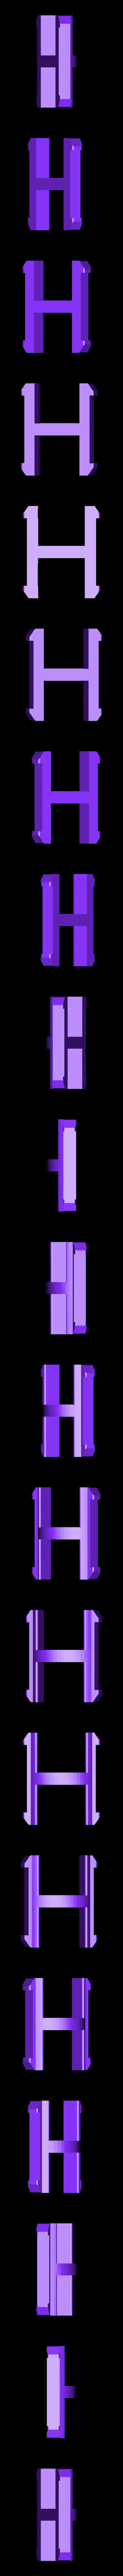 HClip.STL Download free STL file Squishy Turtle • 3D print template, jakejake